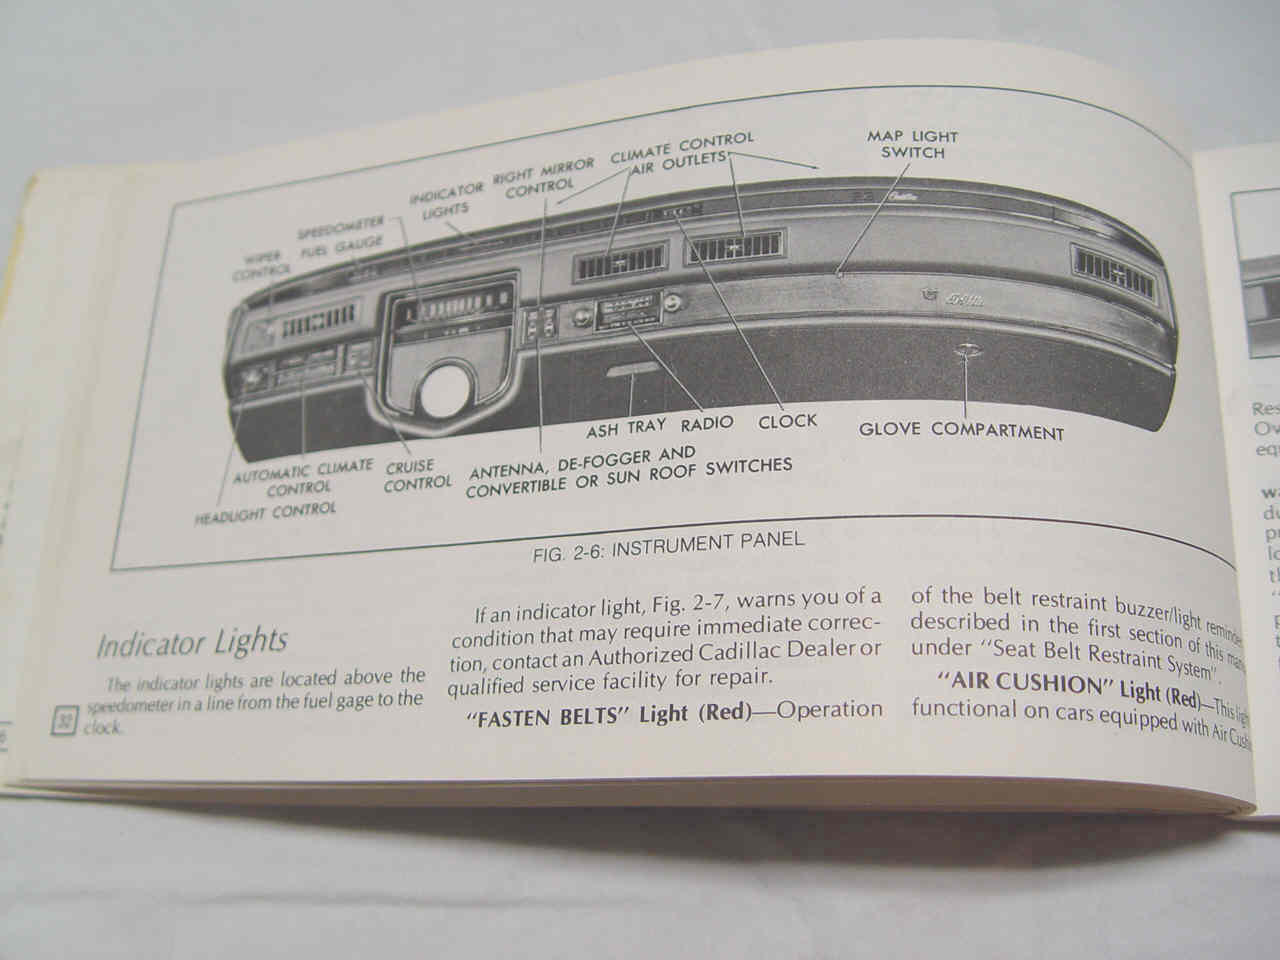 1976 cadillac owners manual and rh cadillacville com 1976 cadillac eldorado service manual 1978 Cadillac